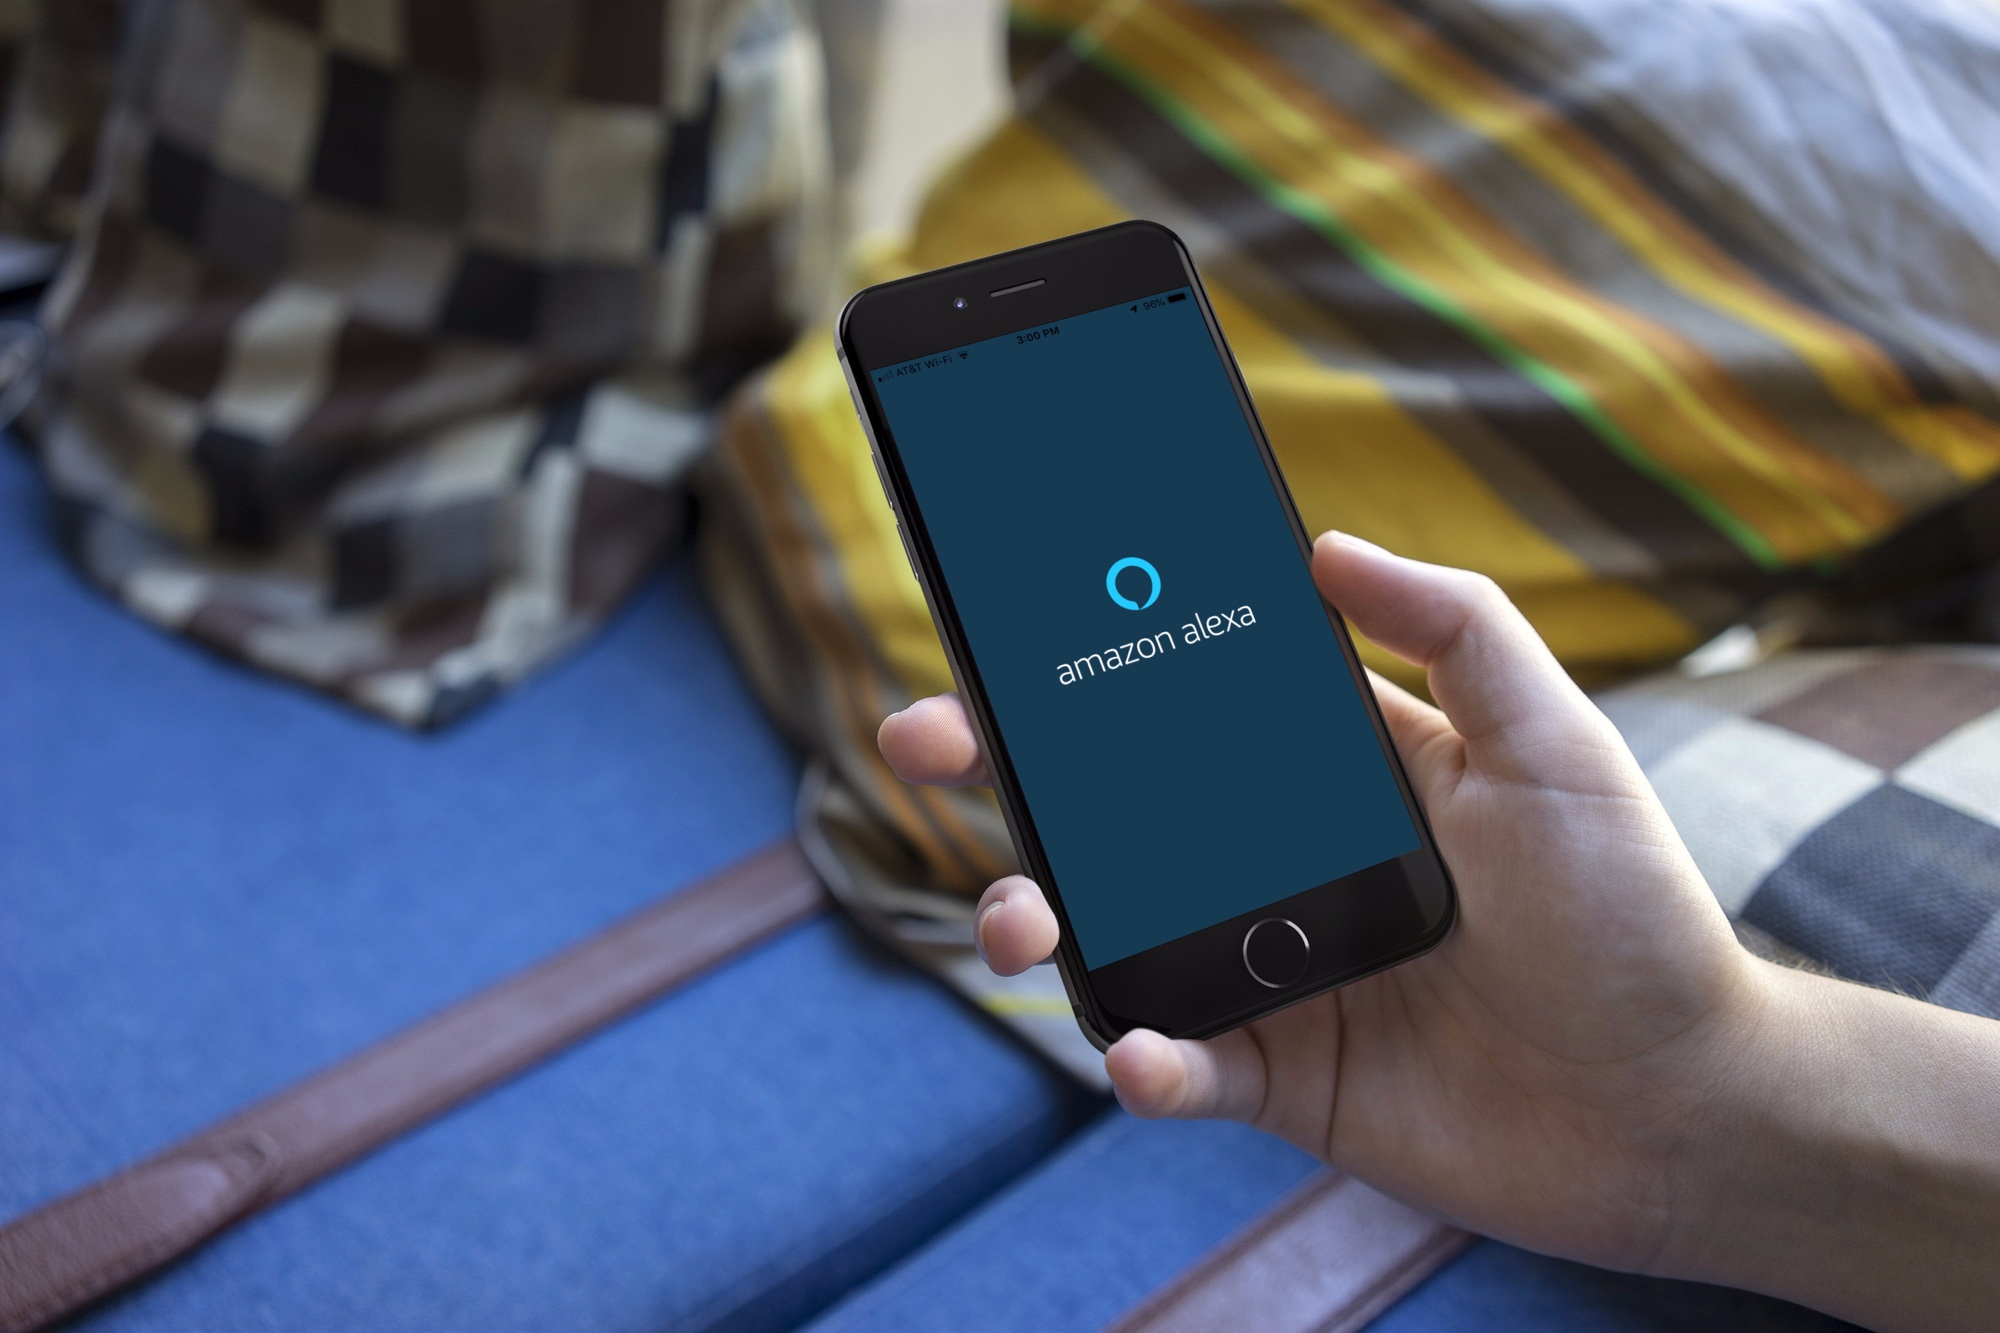 Amazon Alexa app on iPhone